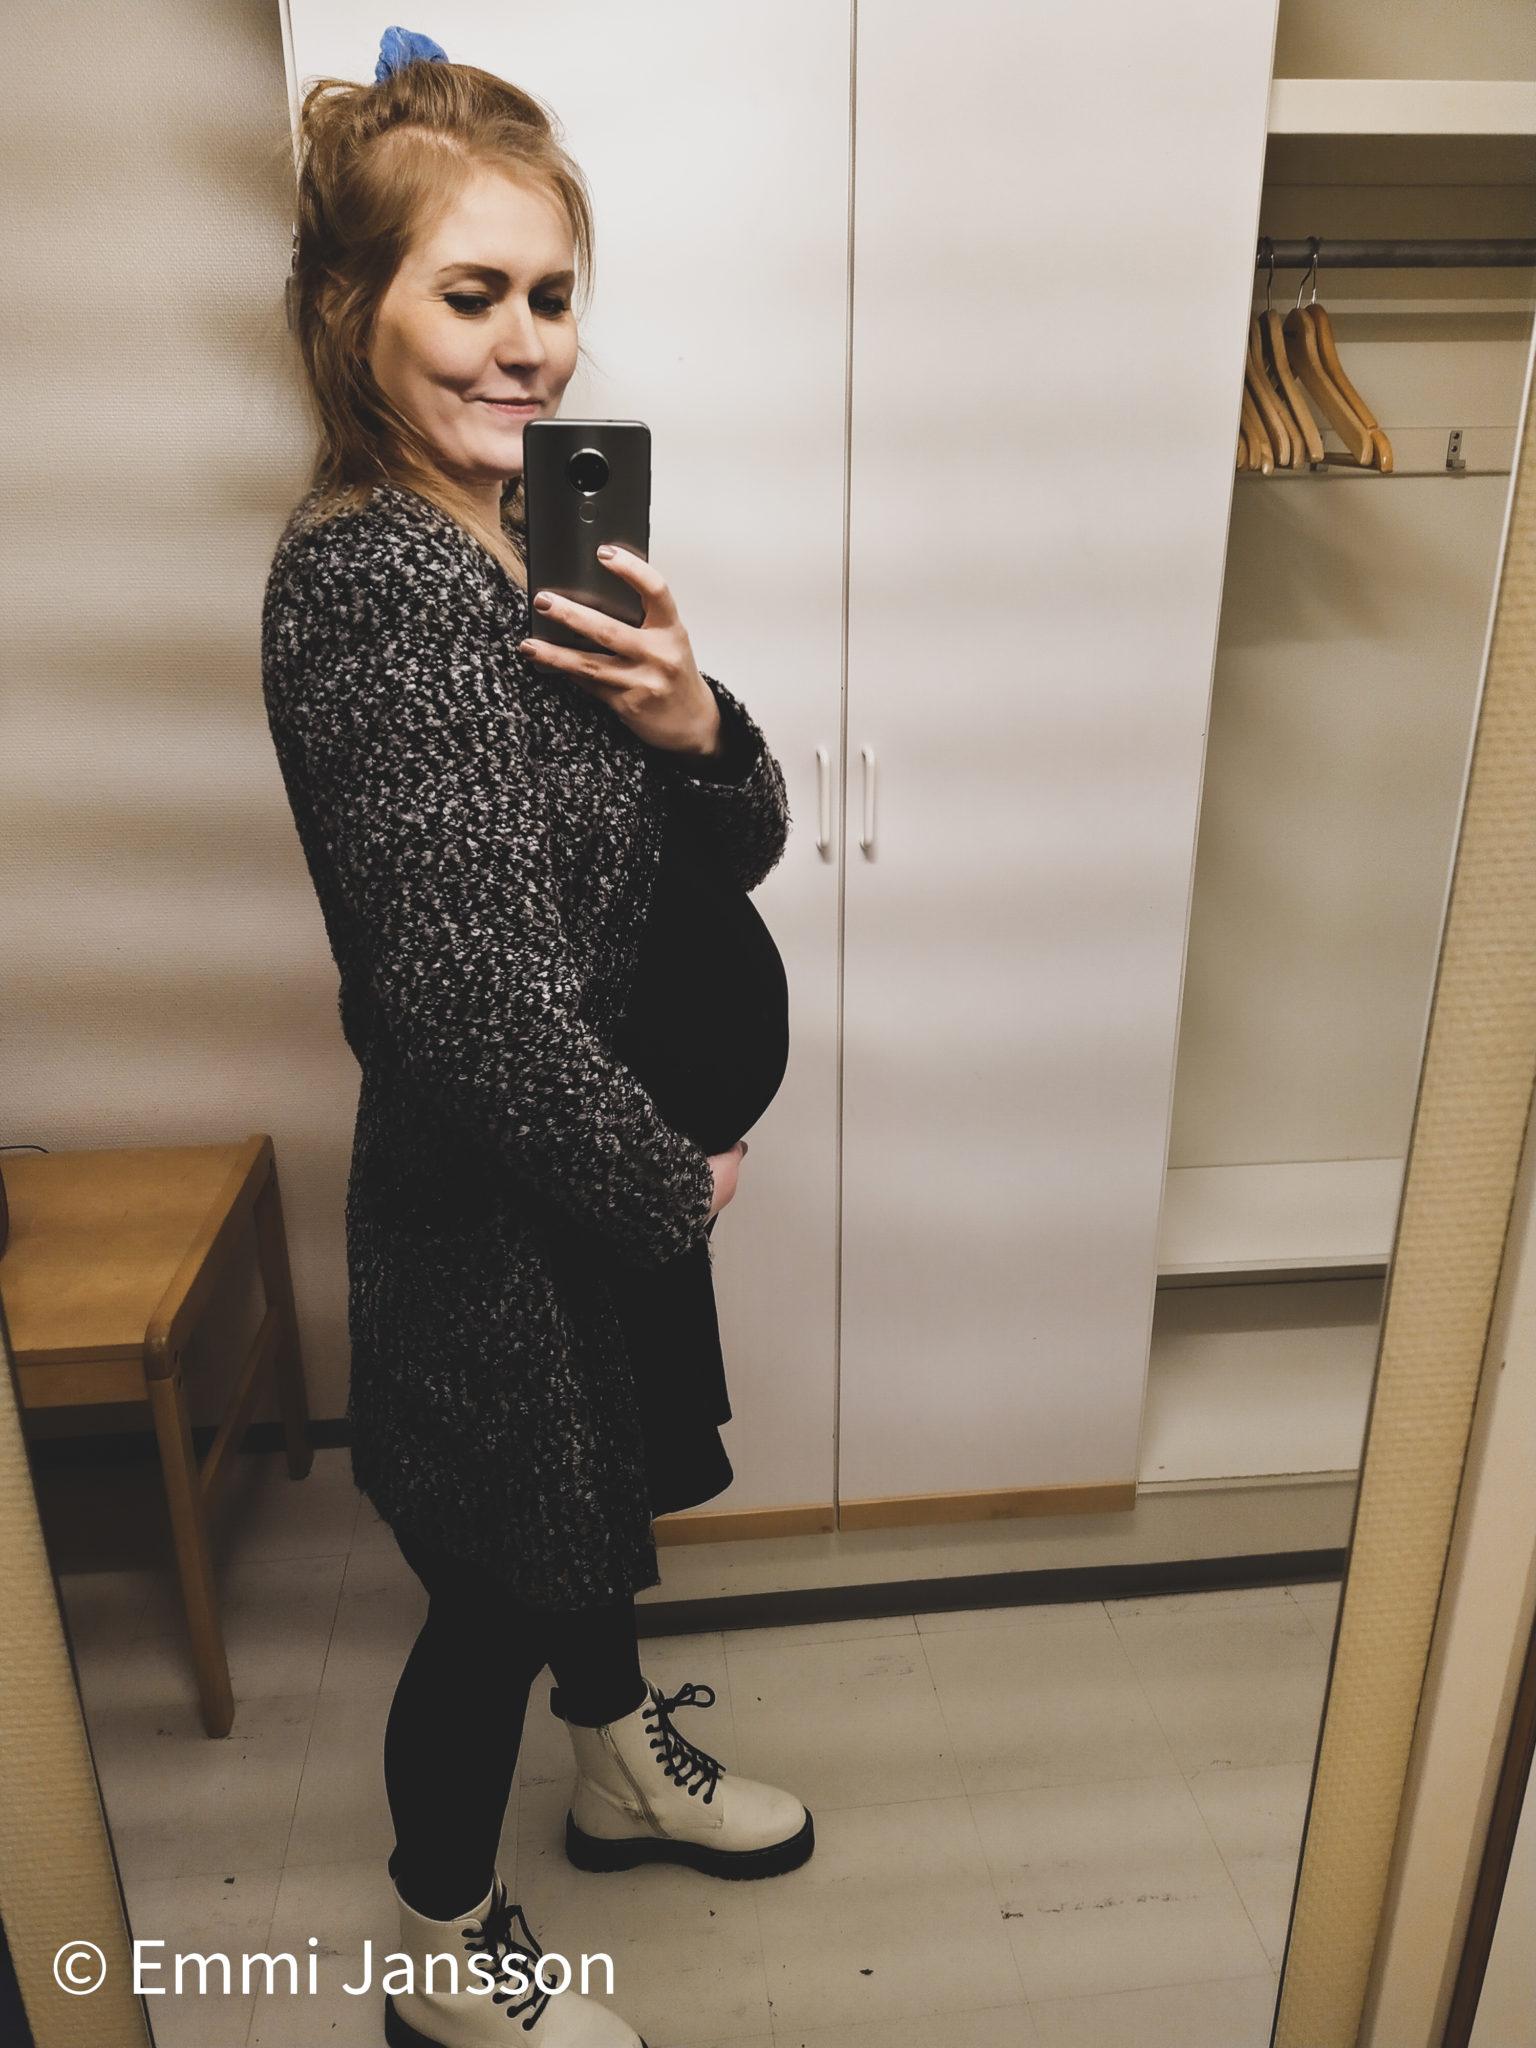 raskaus